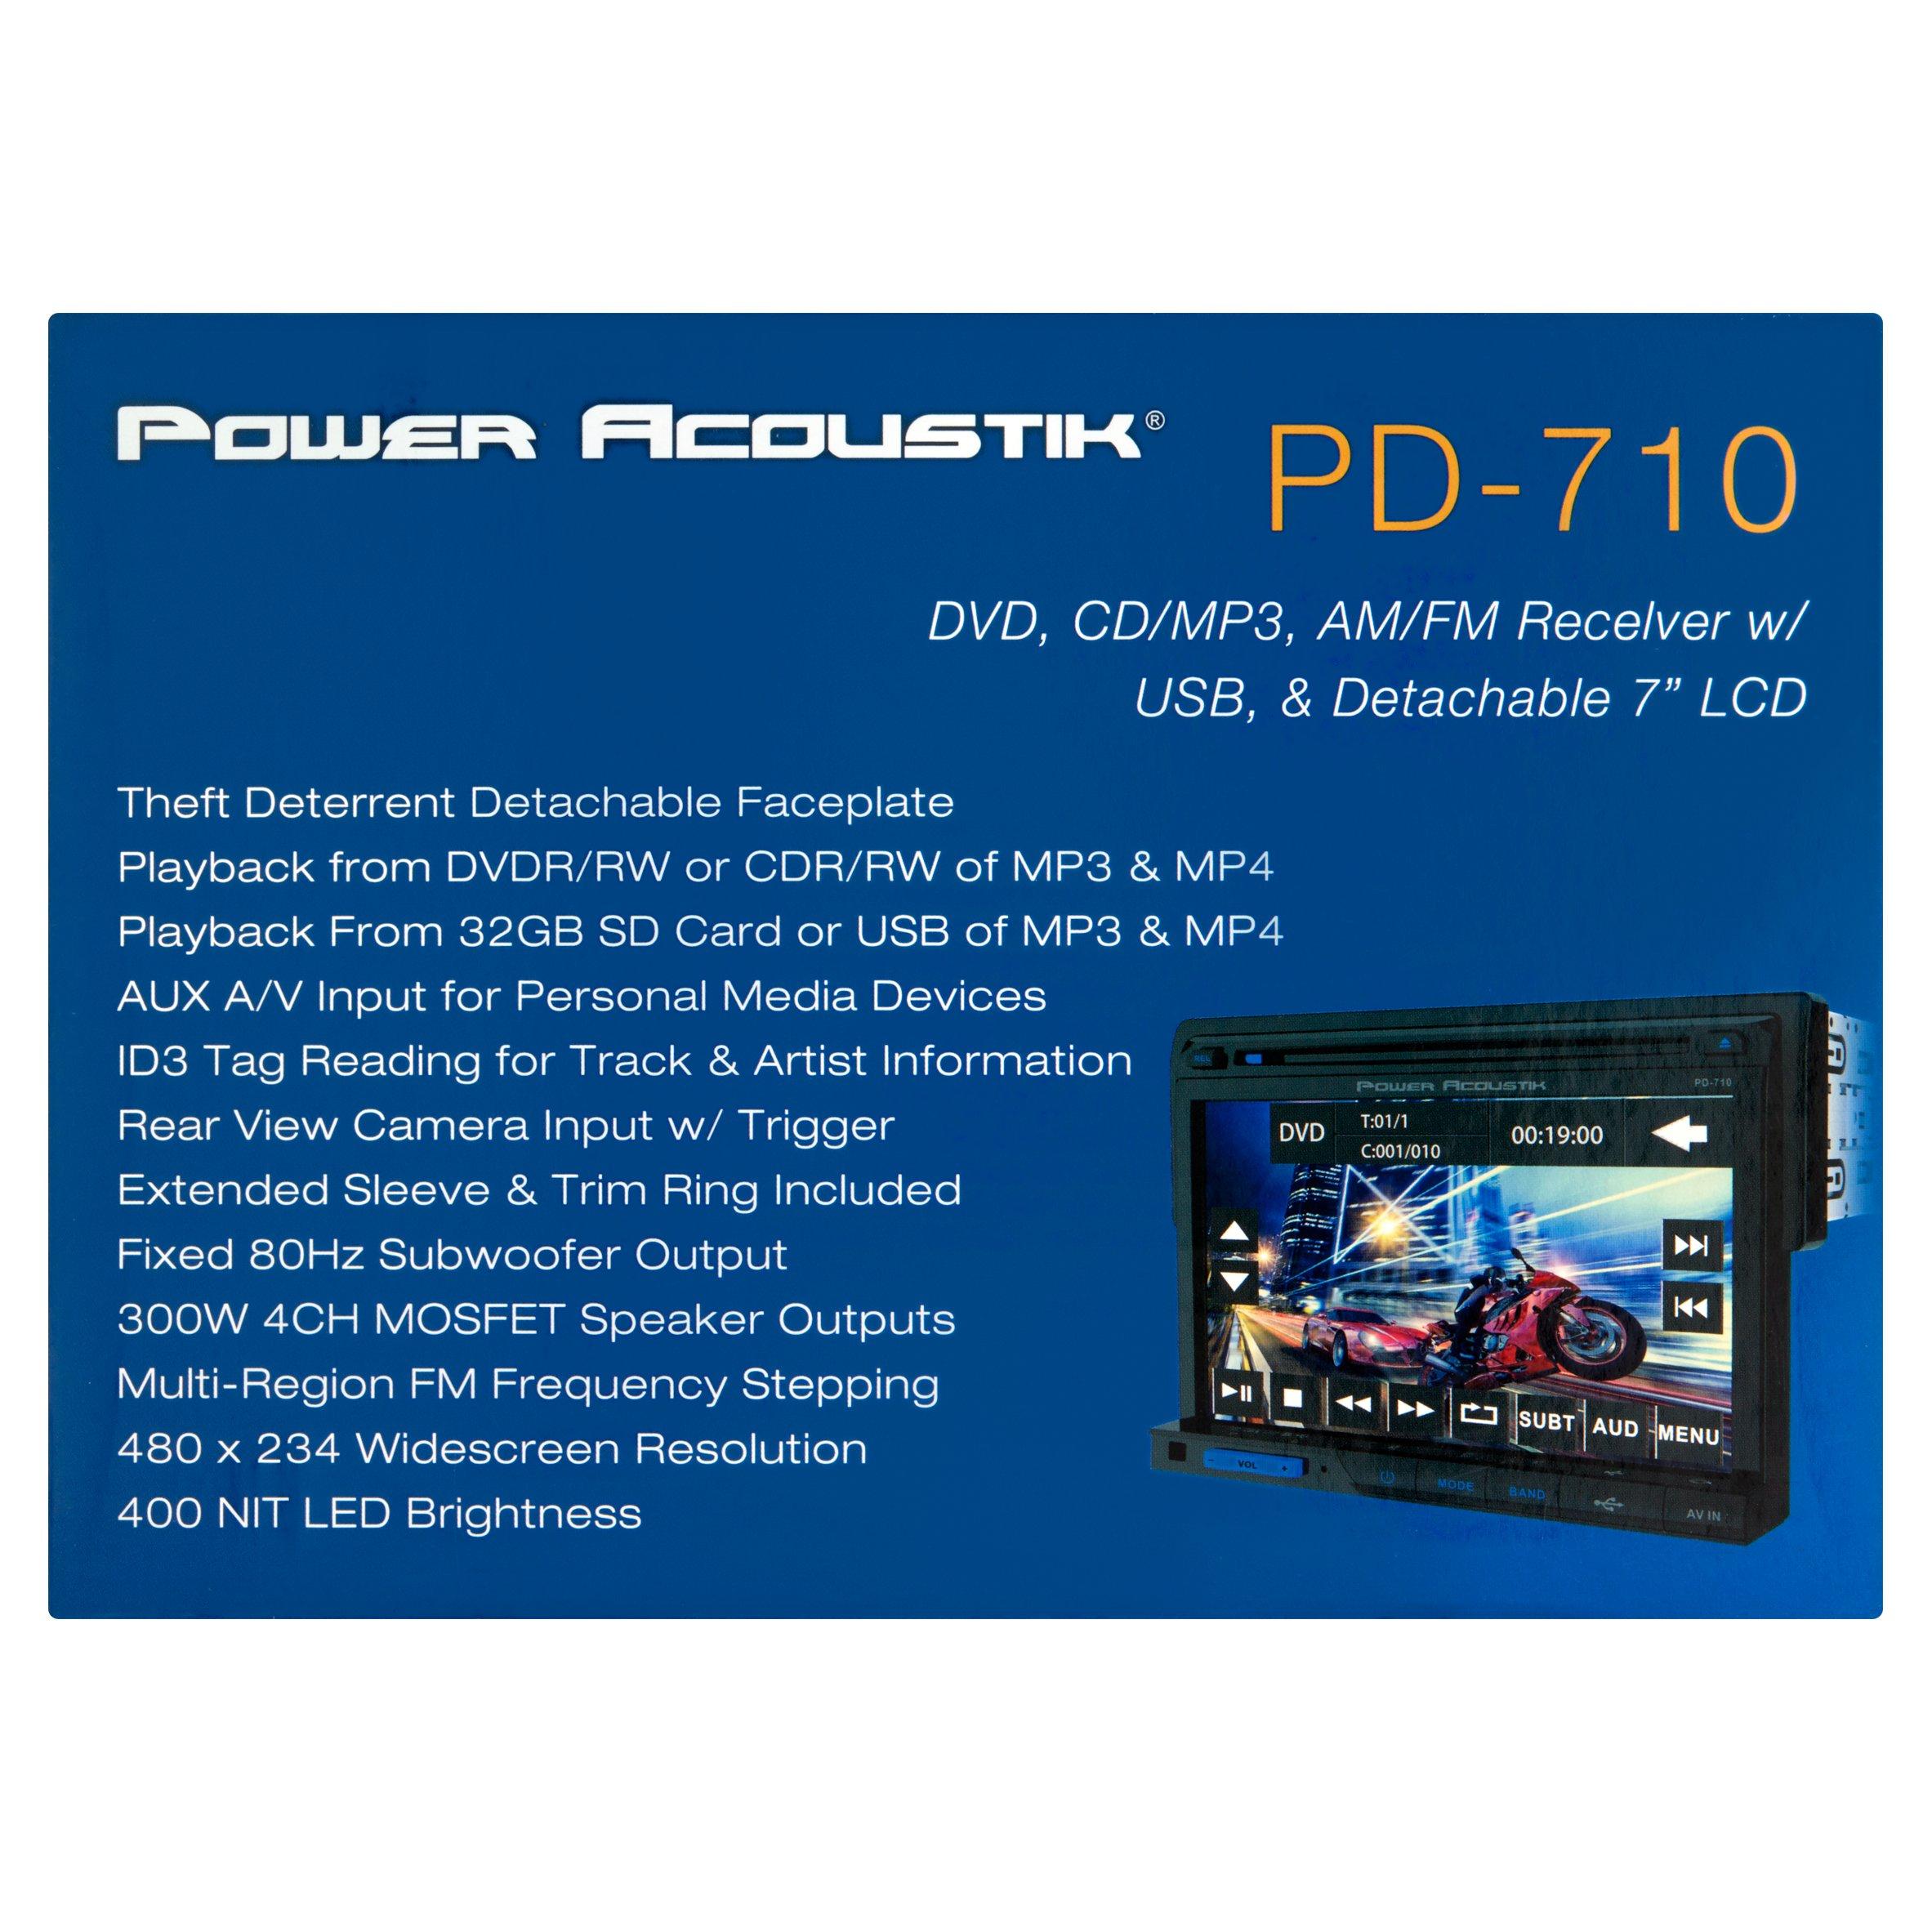 [XOTG_4463]  YB_4580] Power Acoustik Pd 710 Wire Diagram Wiring Diagram | Power Acoustik Equalizer Wiring Diagrams |  | Akeb Tivexi Wigeg Mohammedshrine Librar Wiring 101